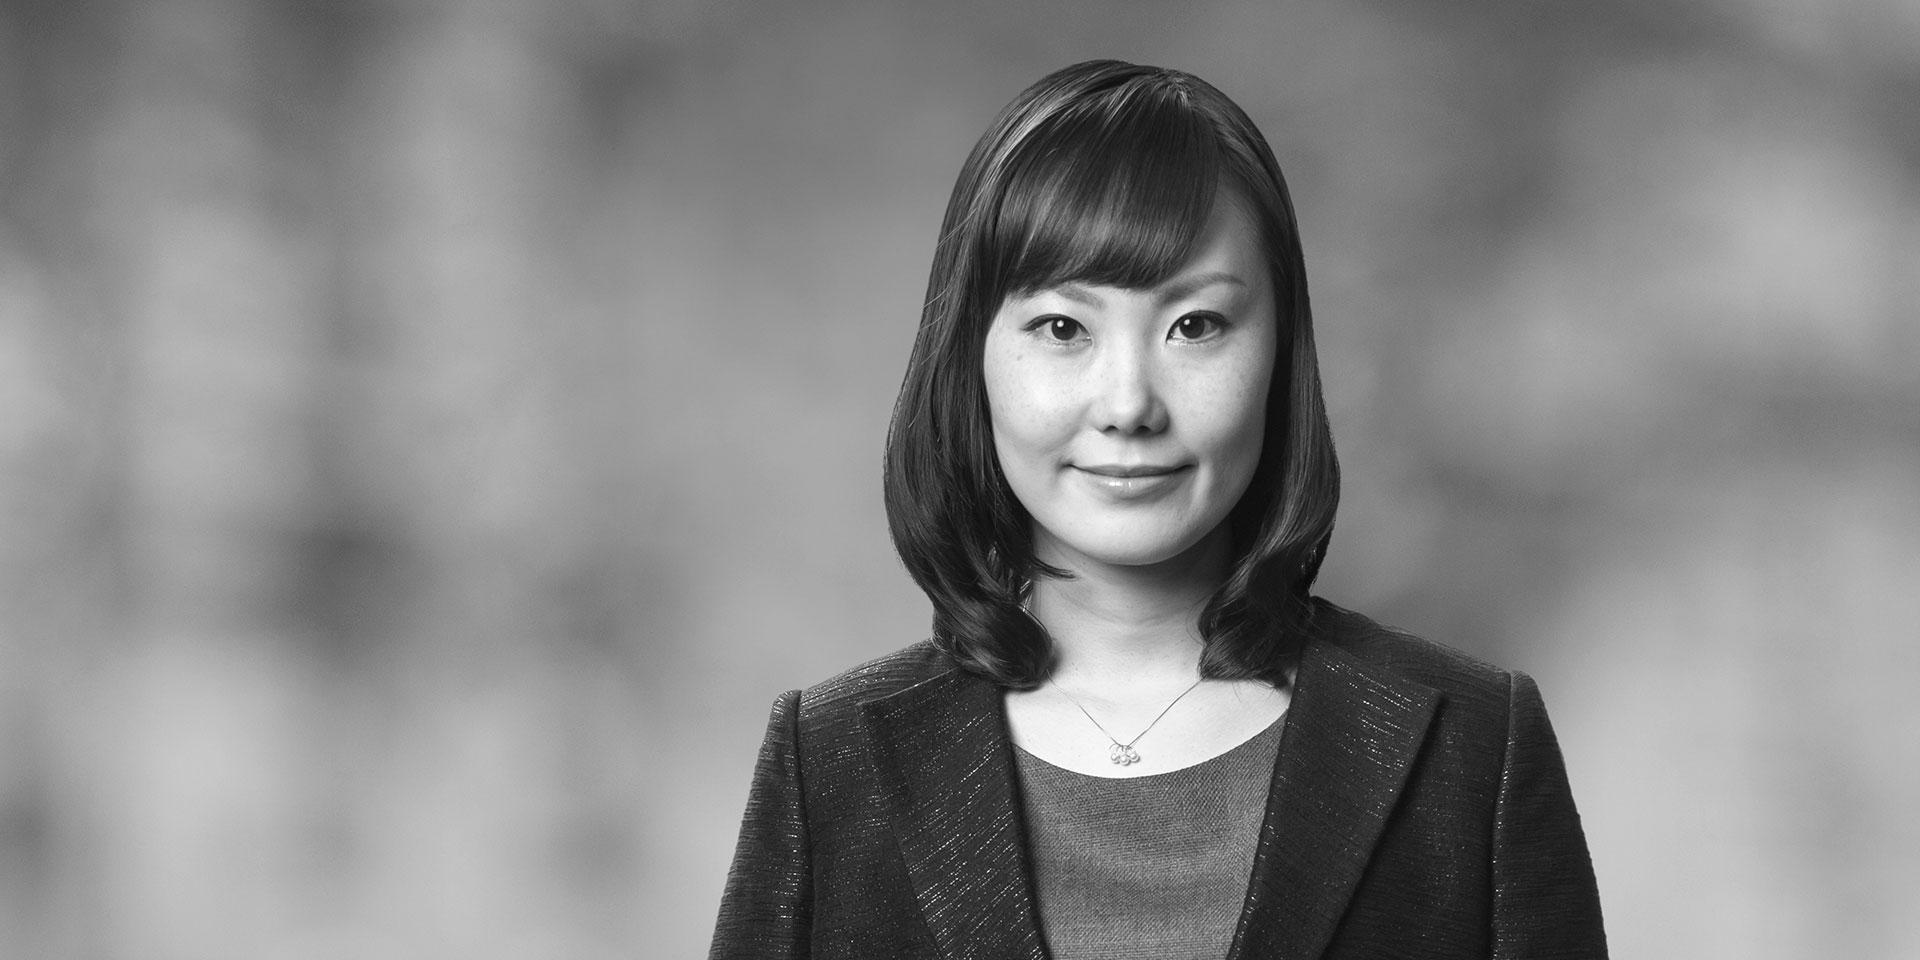 Aoi Koyanagi